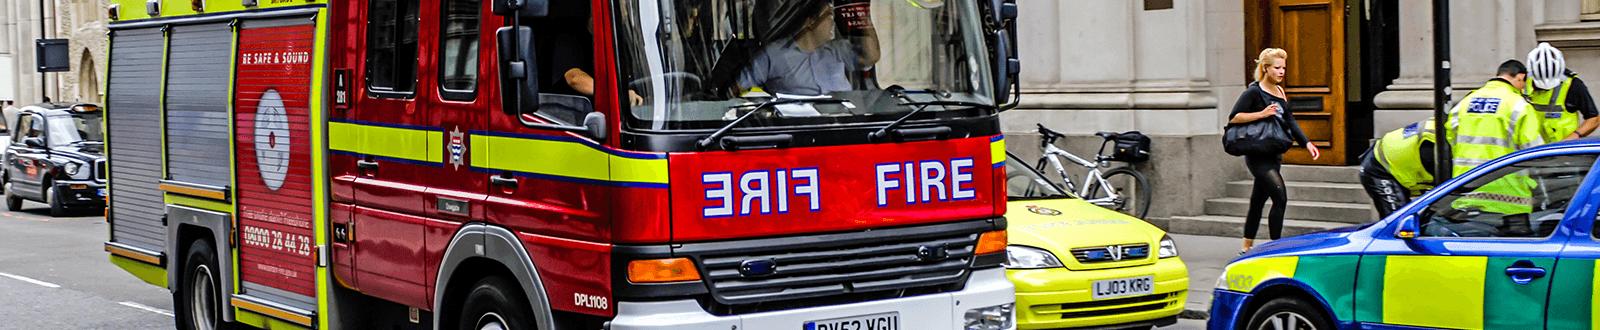 fire service vehicle telematics.